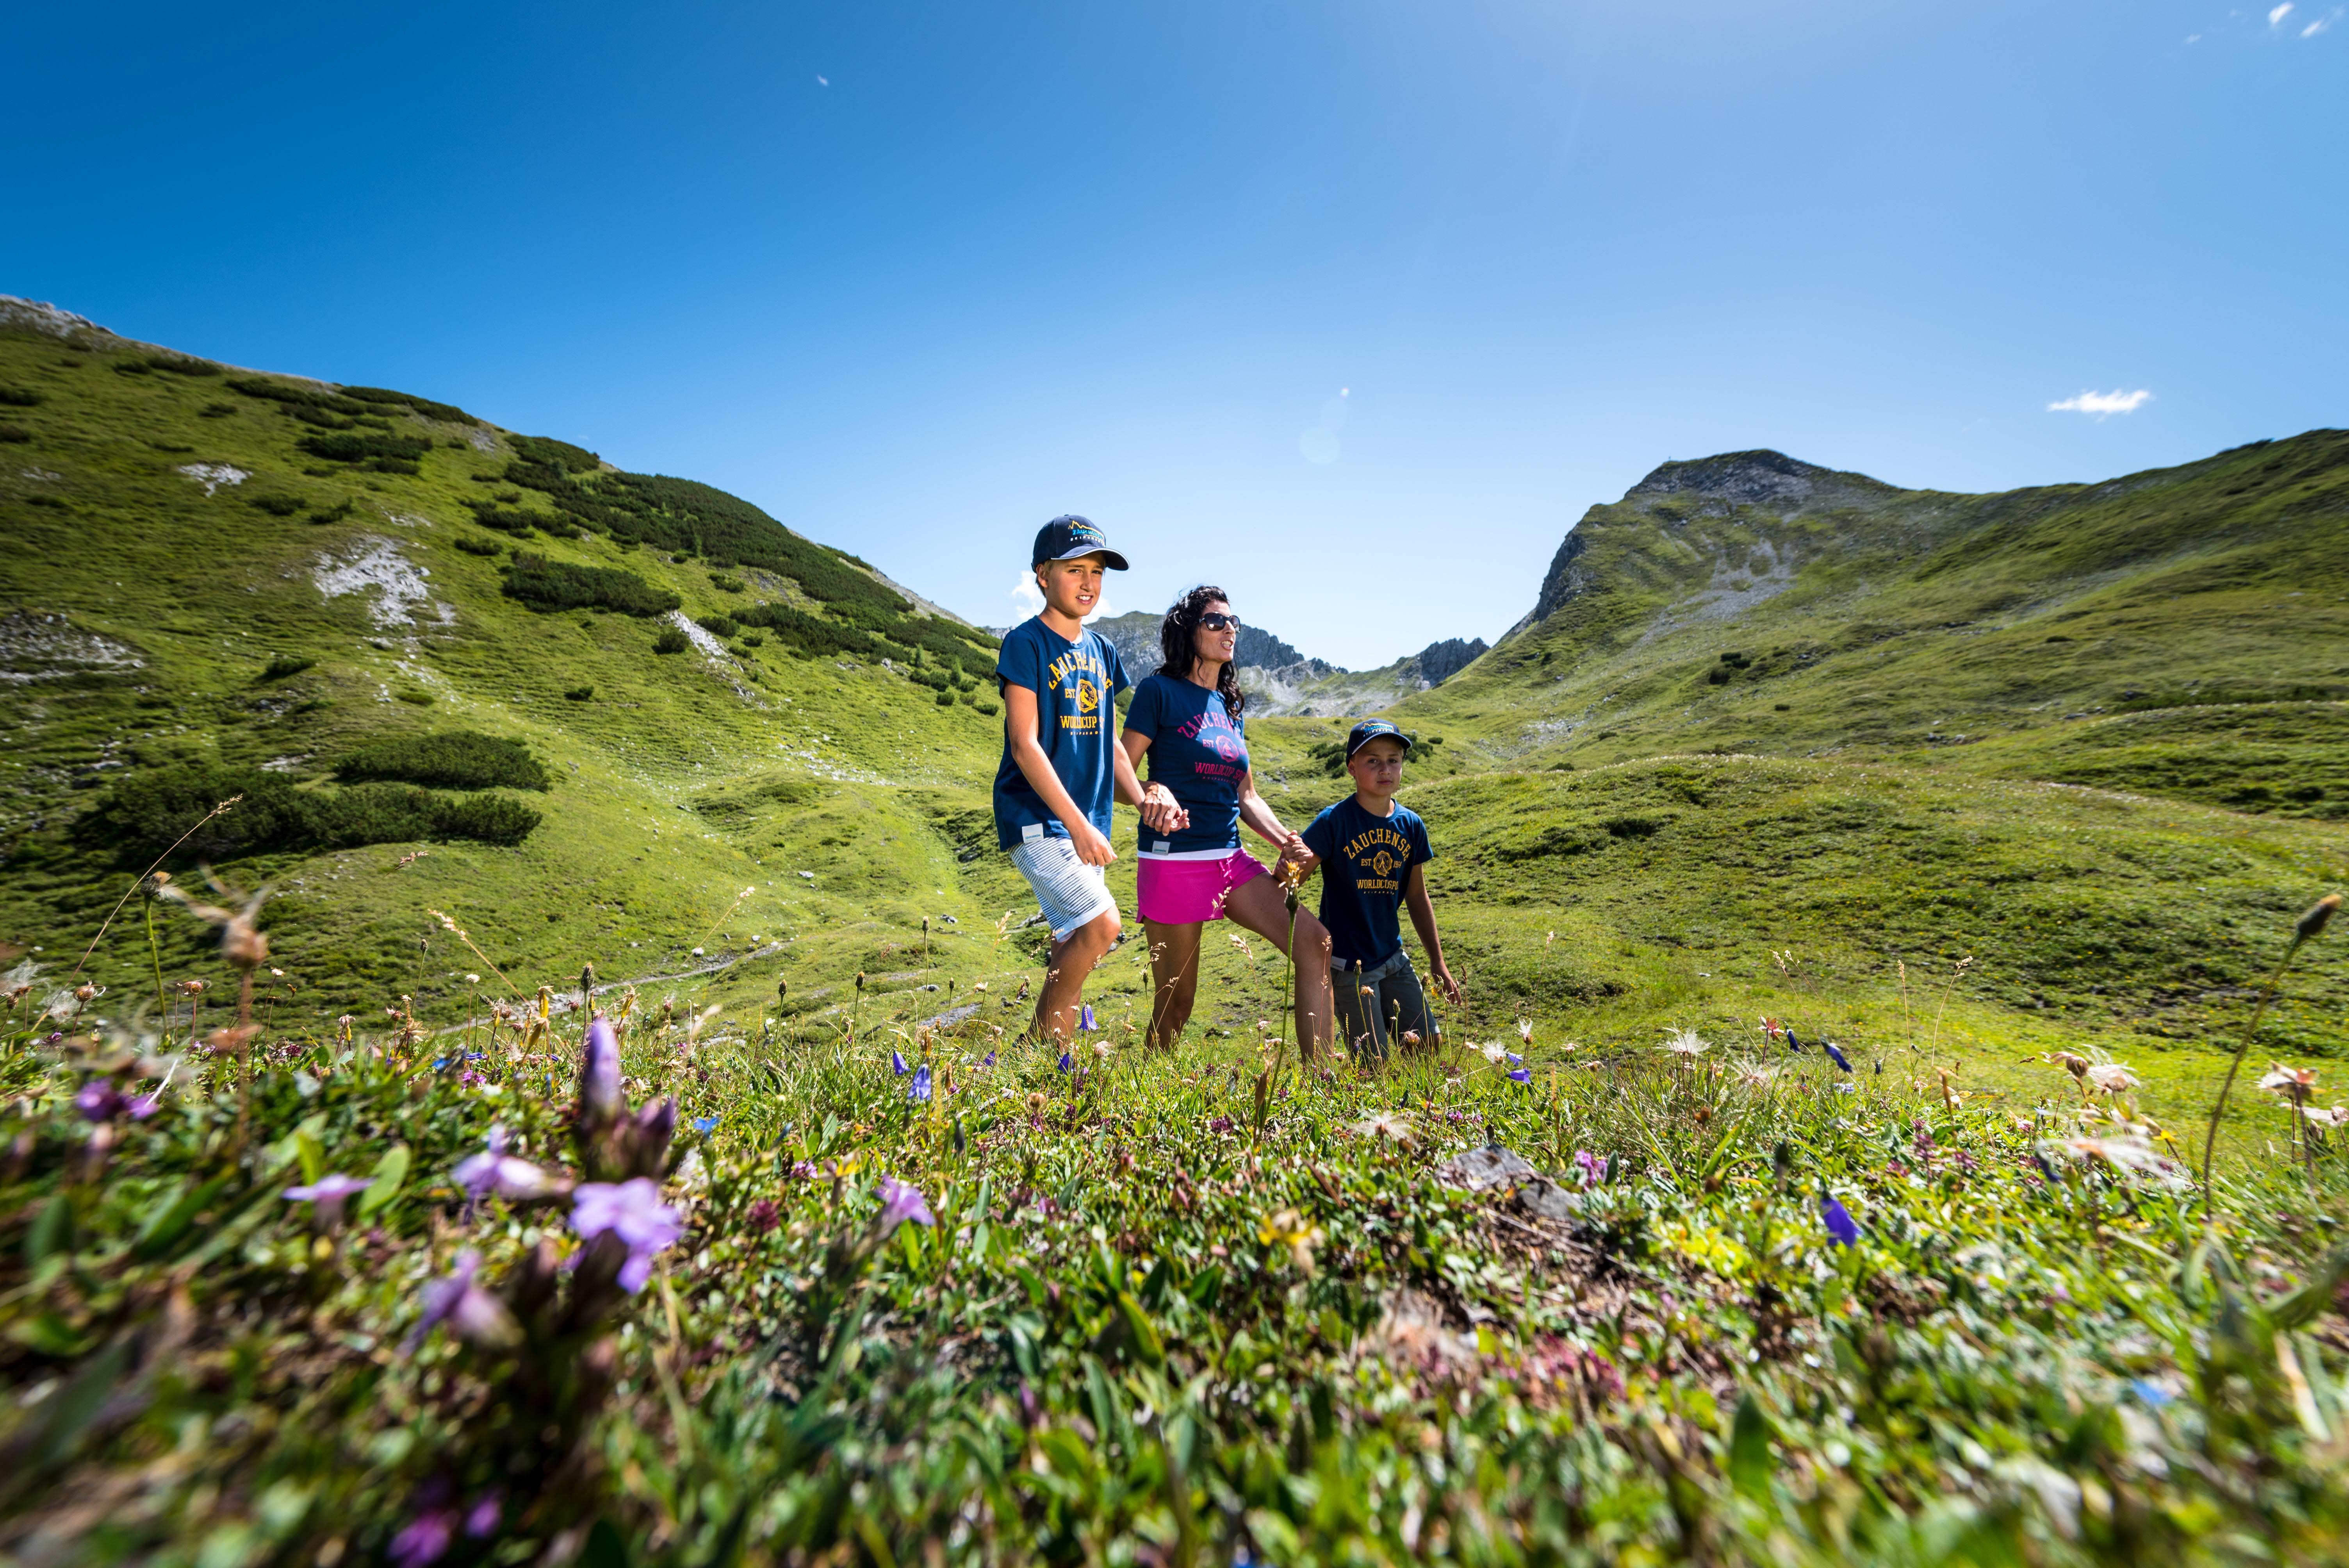 hiking with kids in Salzburg